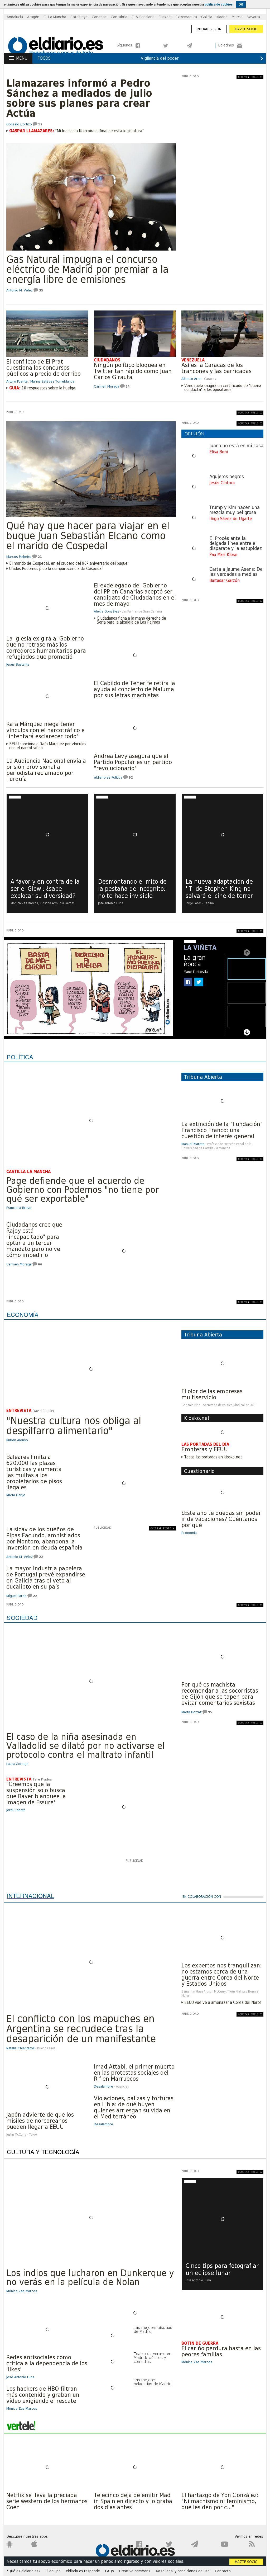 El Diario at Thursday Aug. 10, 2017, 9:03 a.m. UTC